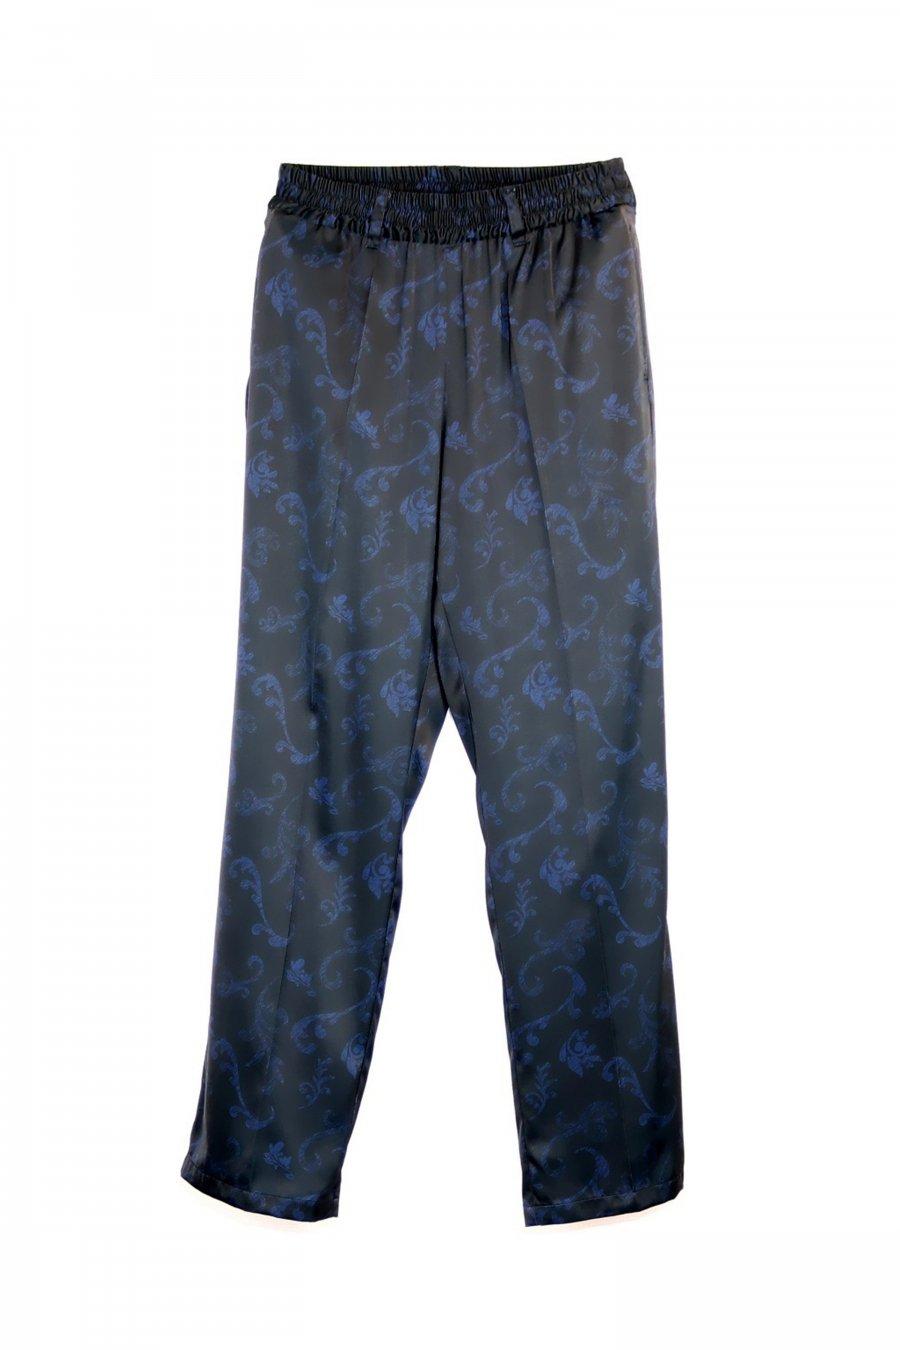 elephant TRIBAL fabrics  Resort Easy PT BLACK(バロック柄)<img class='new_mark_img2' src='https://img.shop-pro.jp/img/new/icons15.gif' style='border:none;display:inline;margin:0px;padding:0px;width:auto;' />